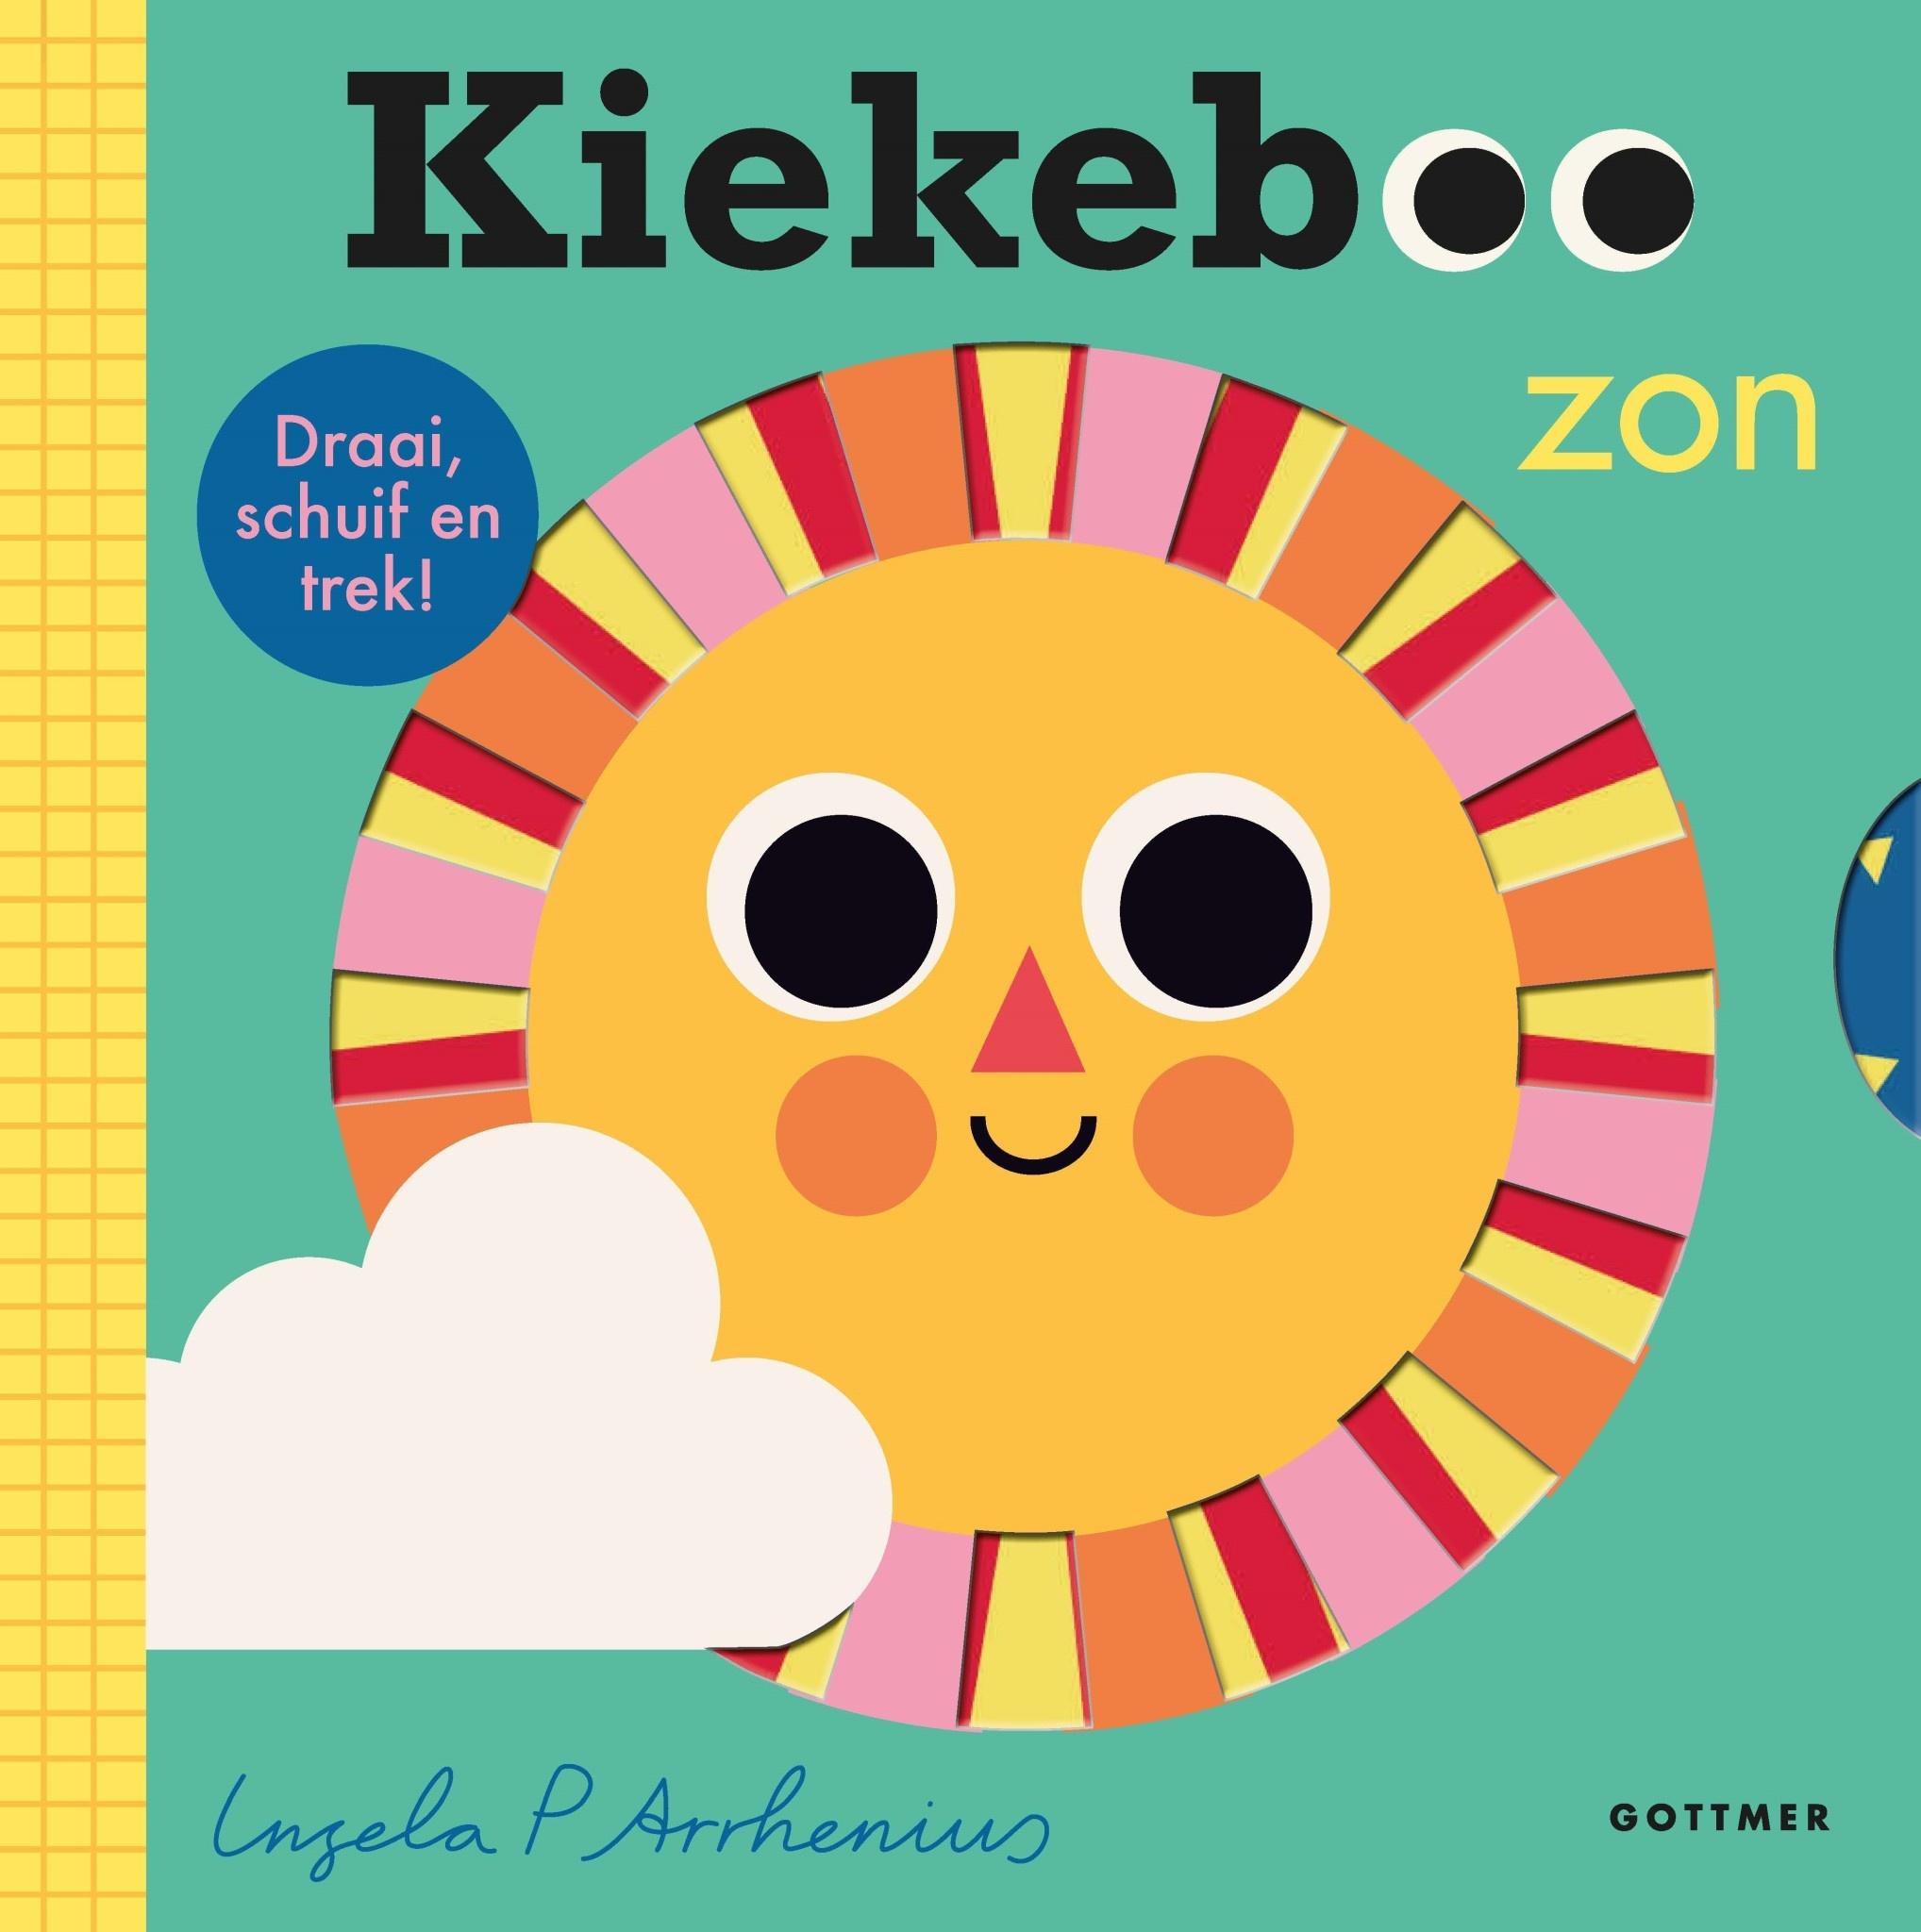 Boek - kiekeboe zon-1